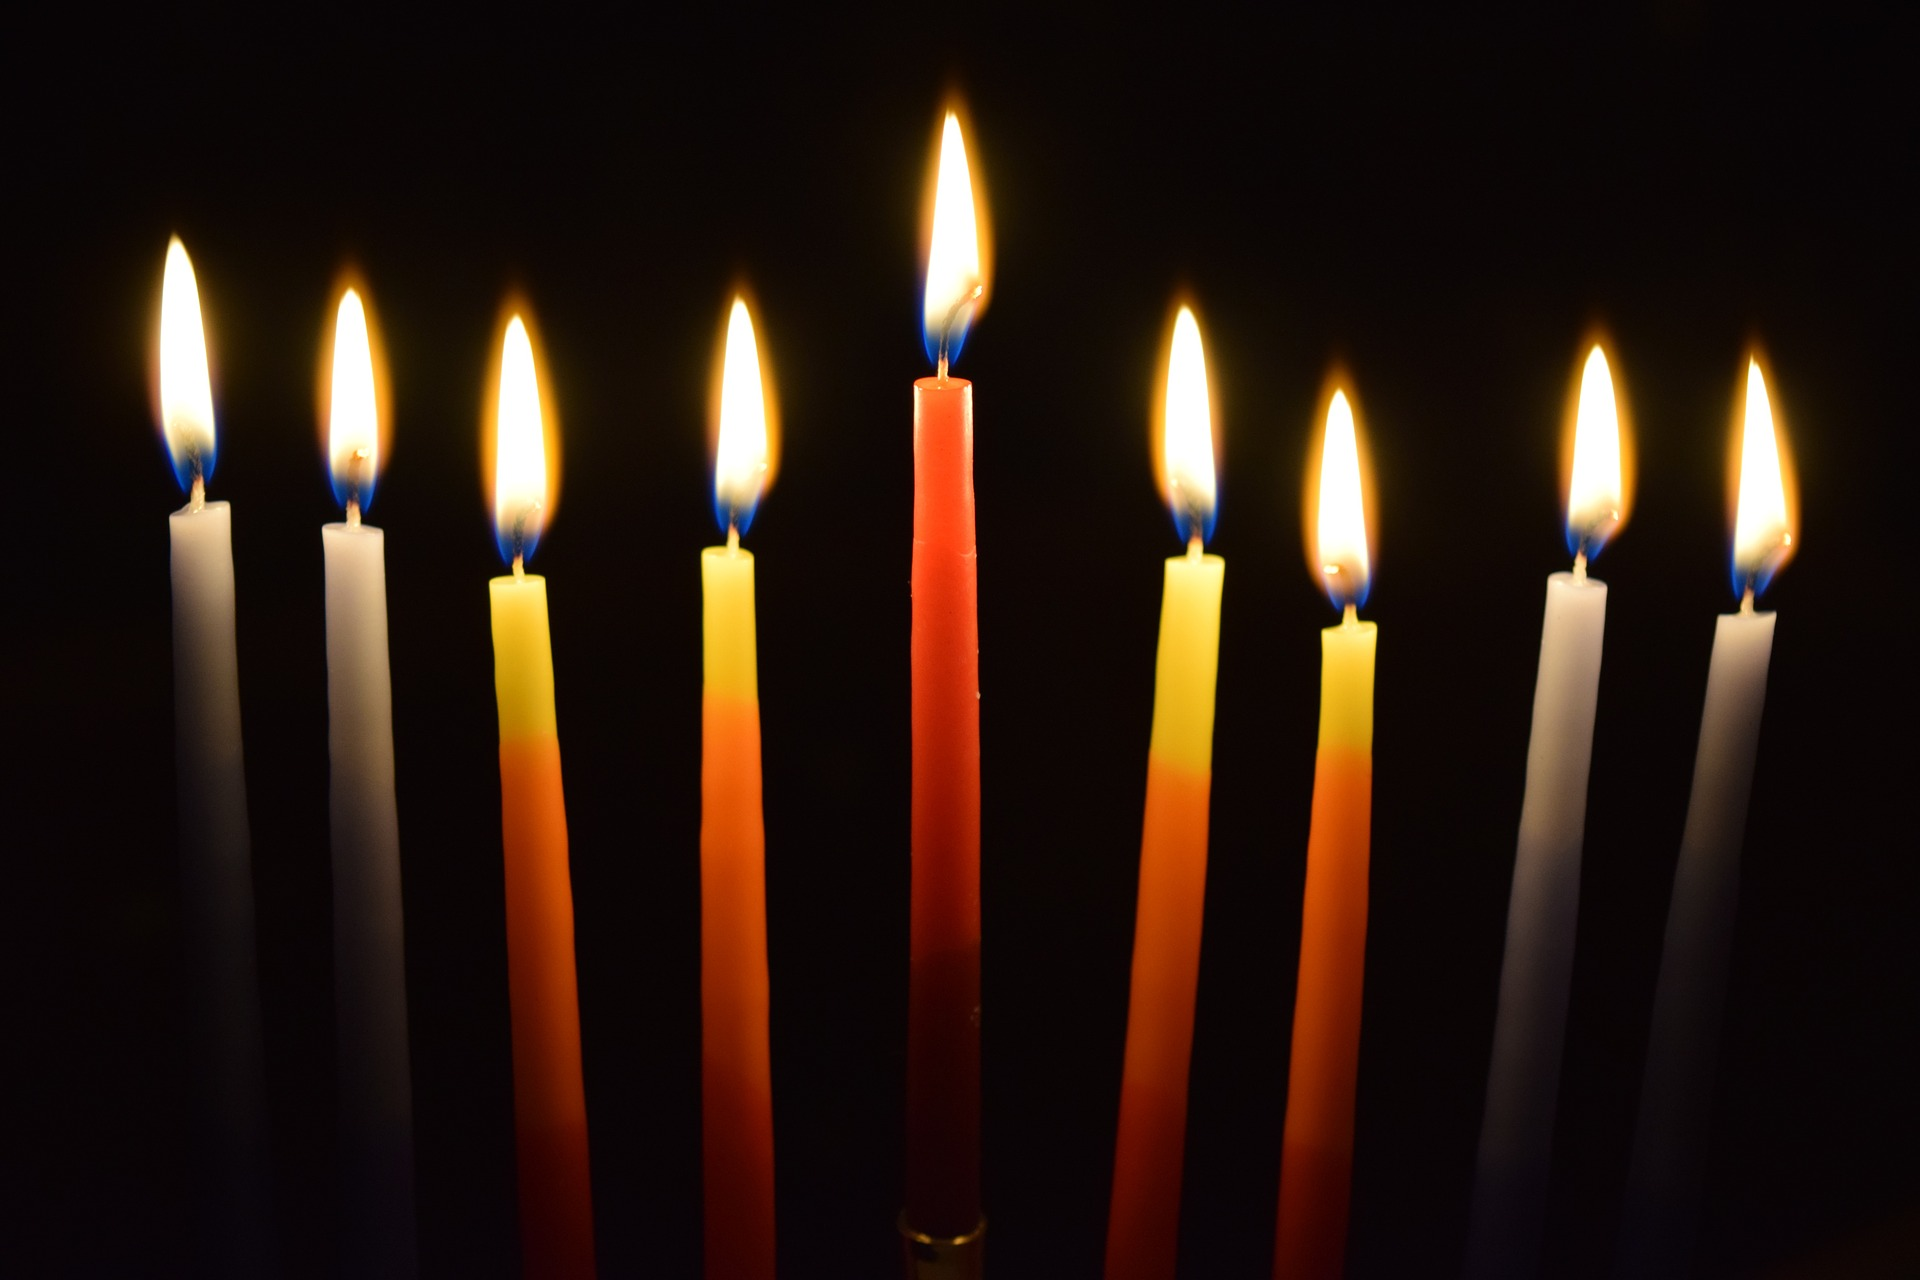 candlelight-1281563_1920.jpg